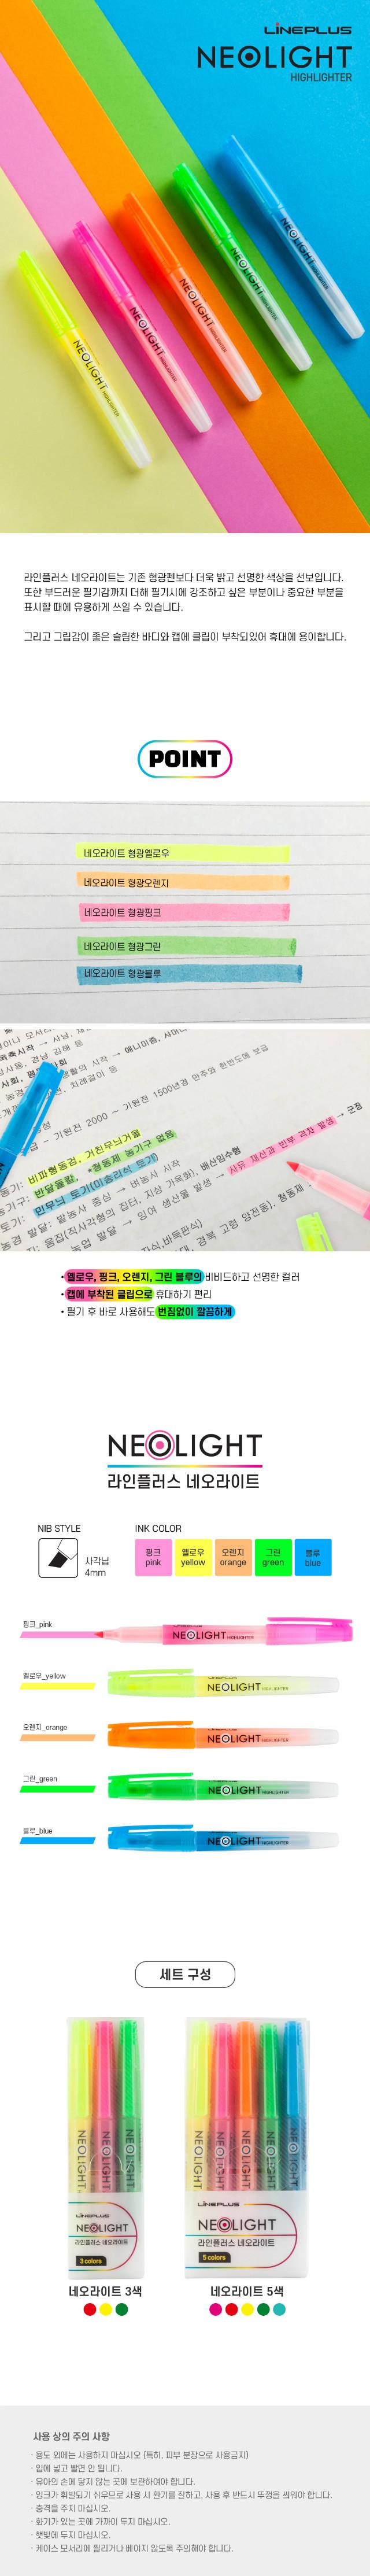 neolight_list.jpg